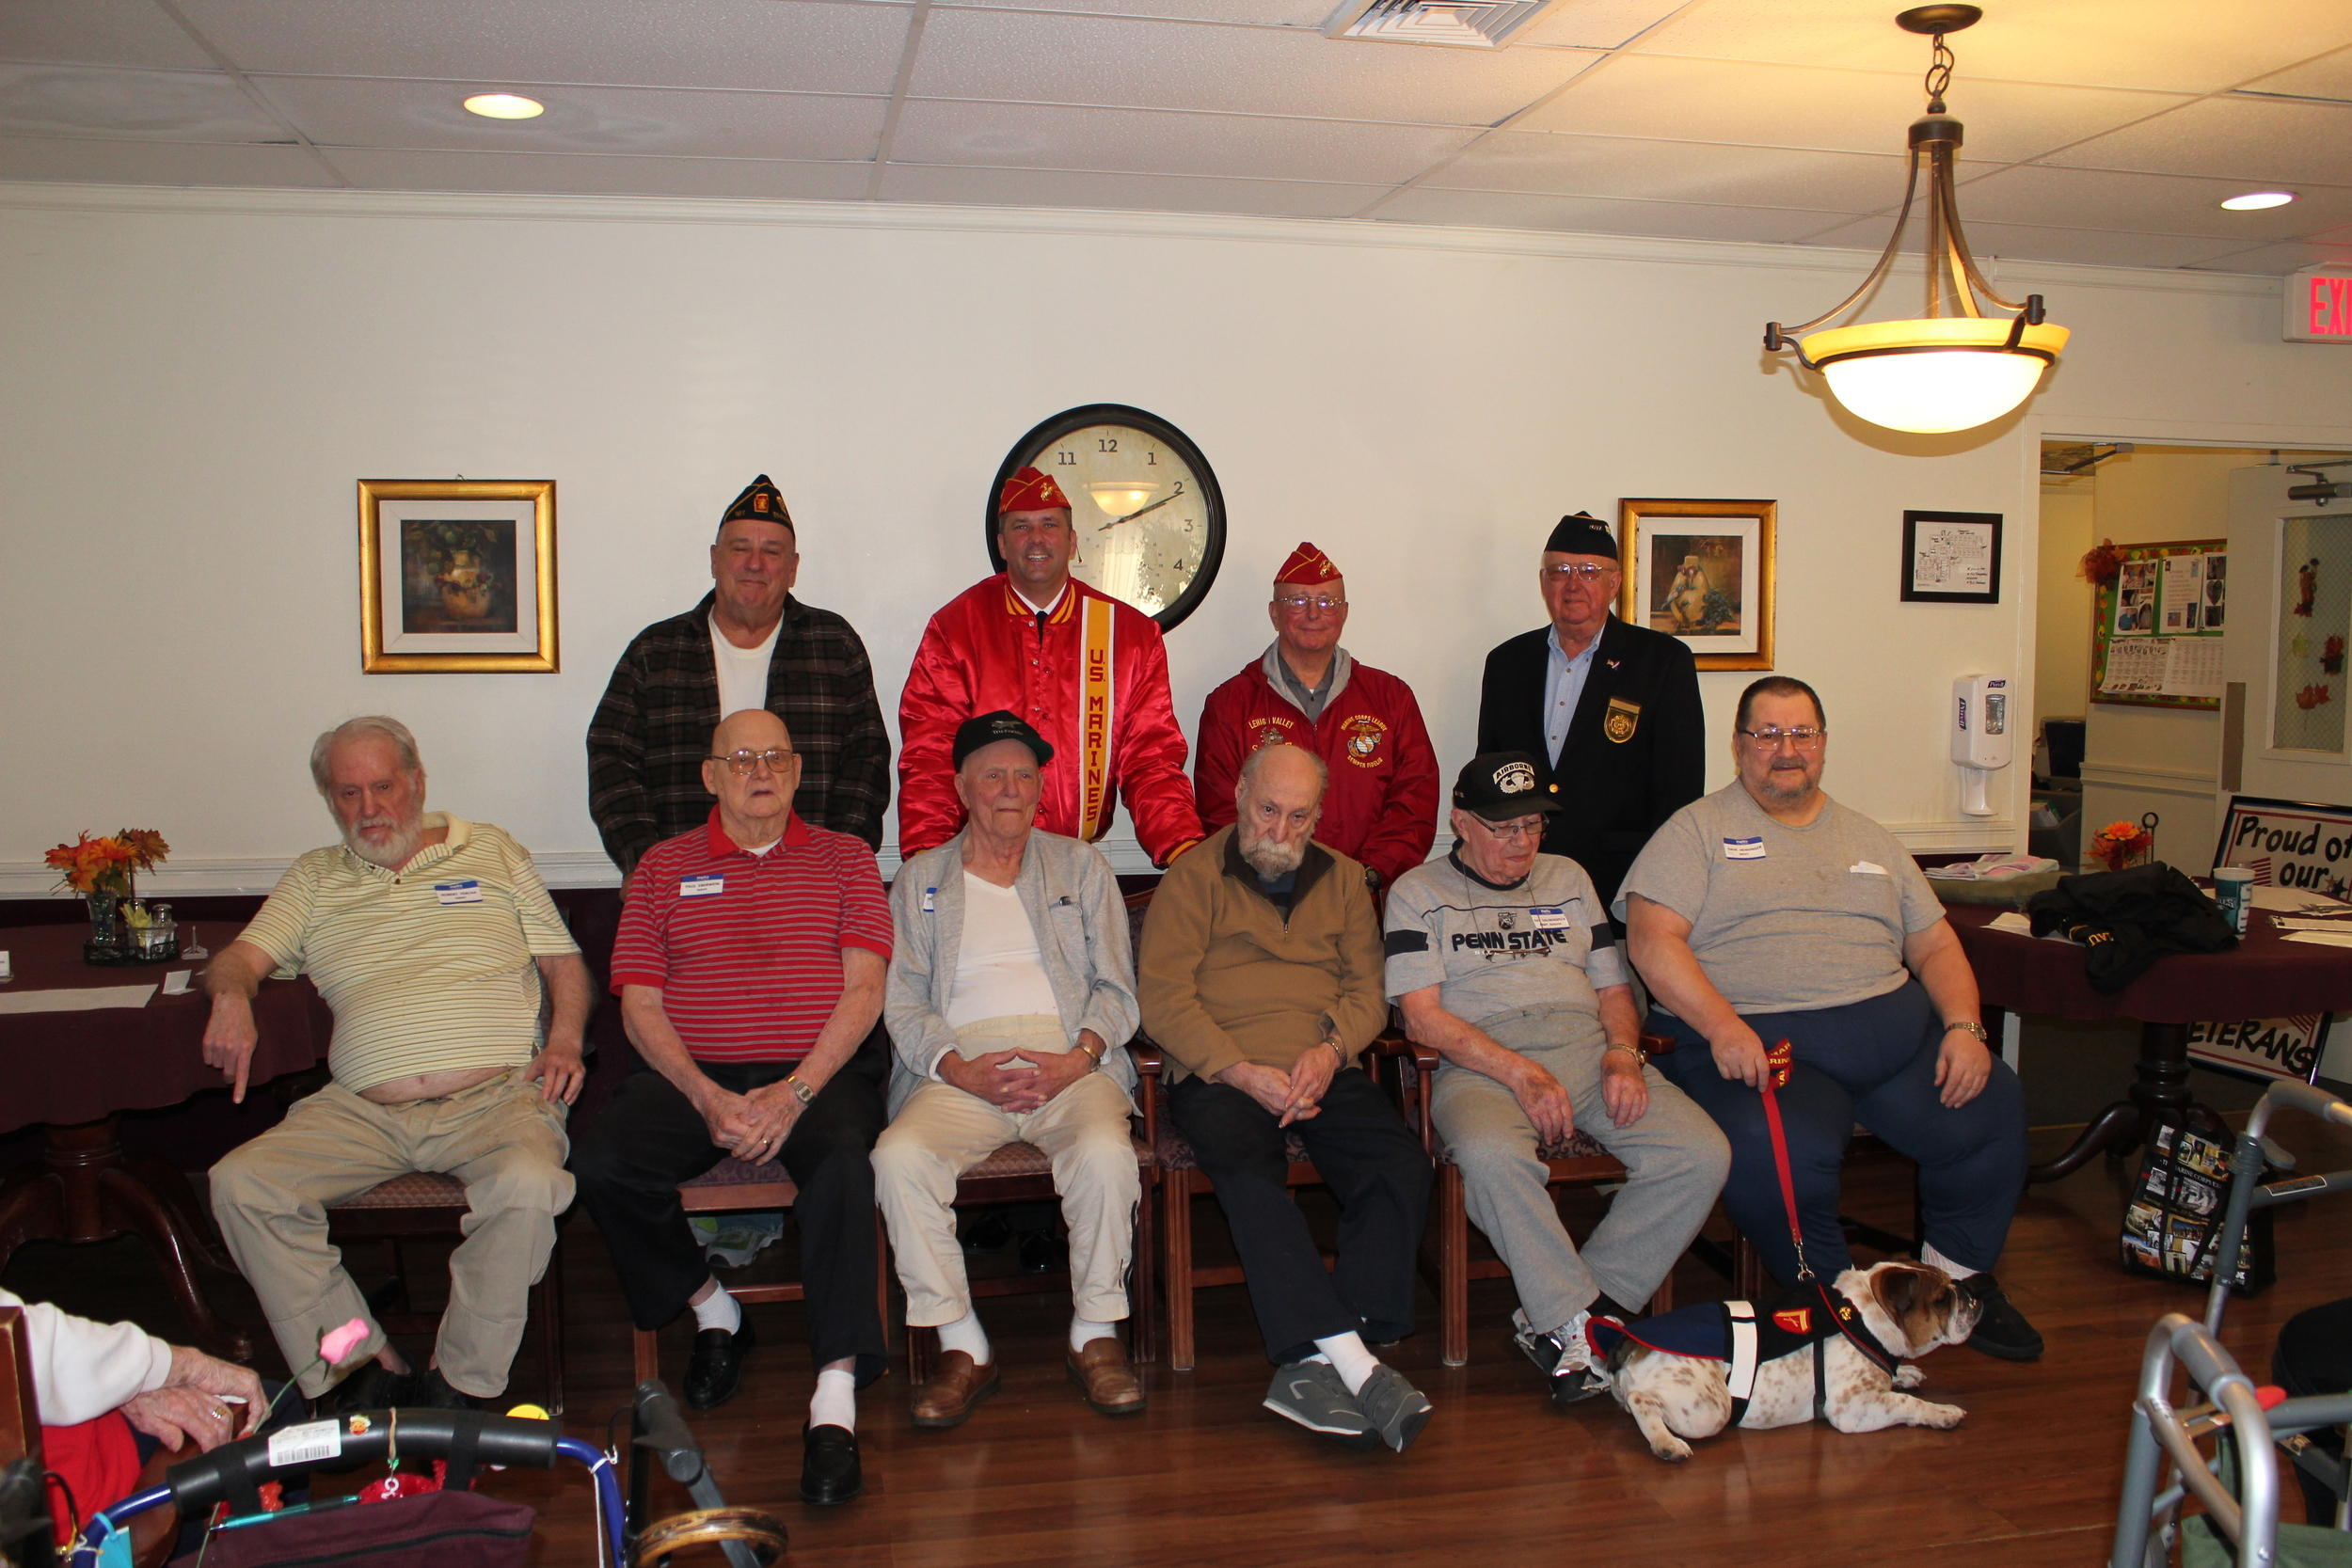 veterans day visit broad st emmaus (2).JPG